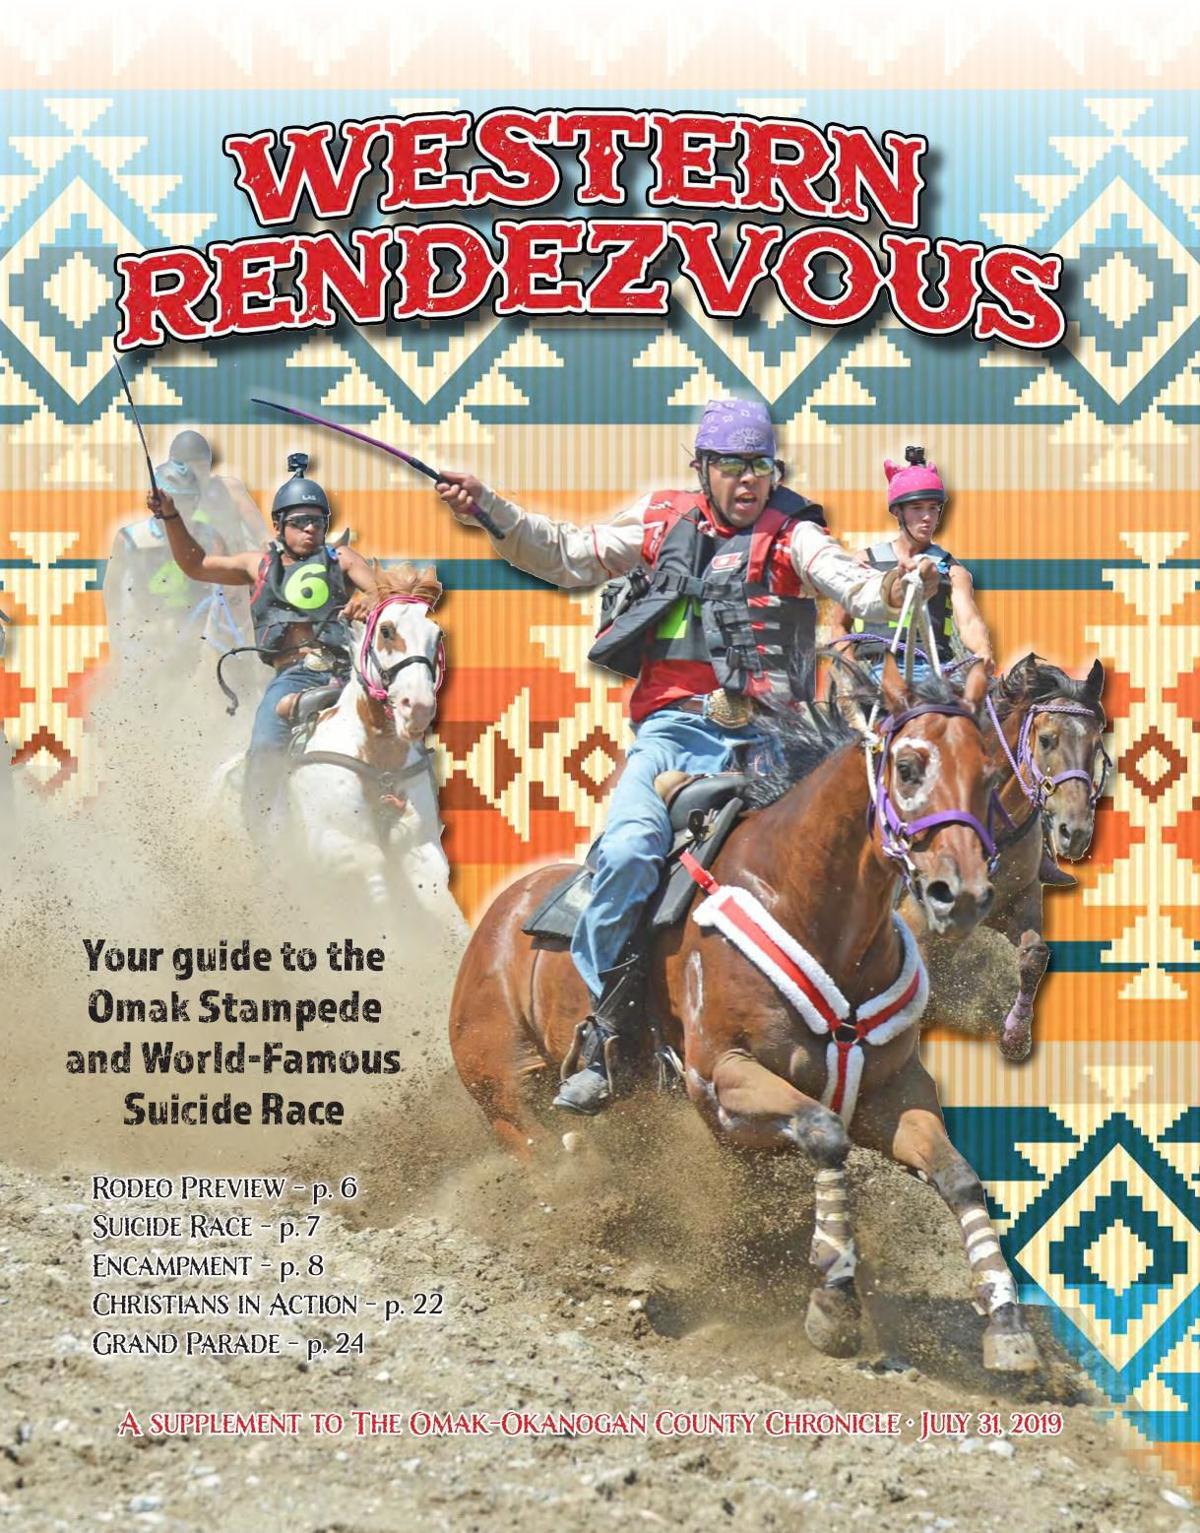 Western Rendezvous 2019